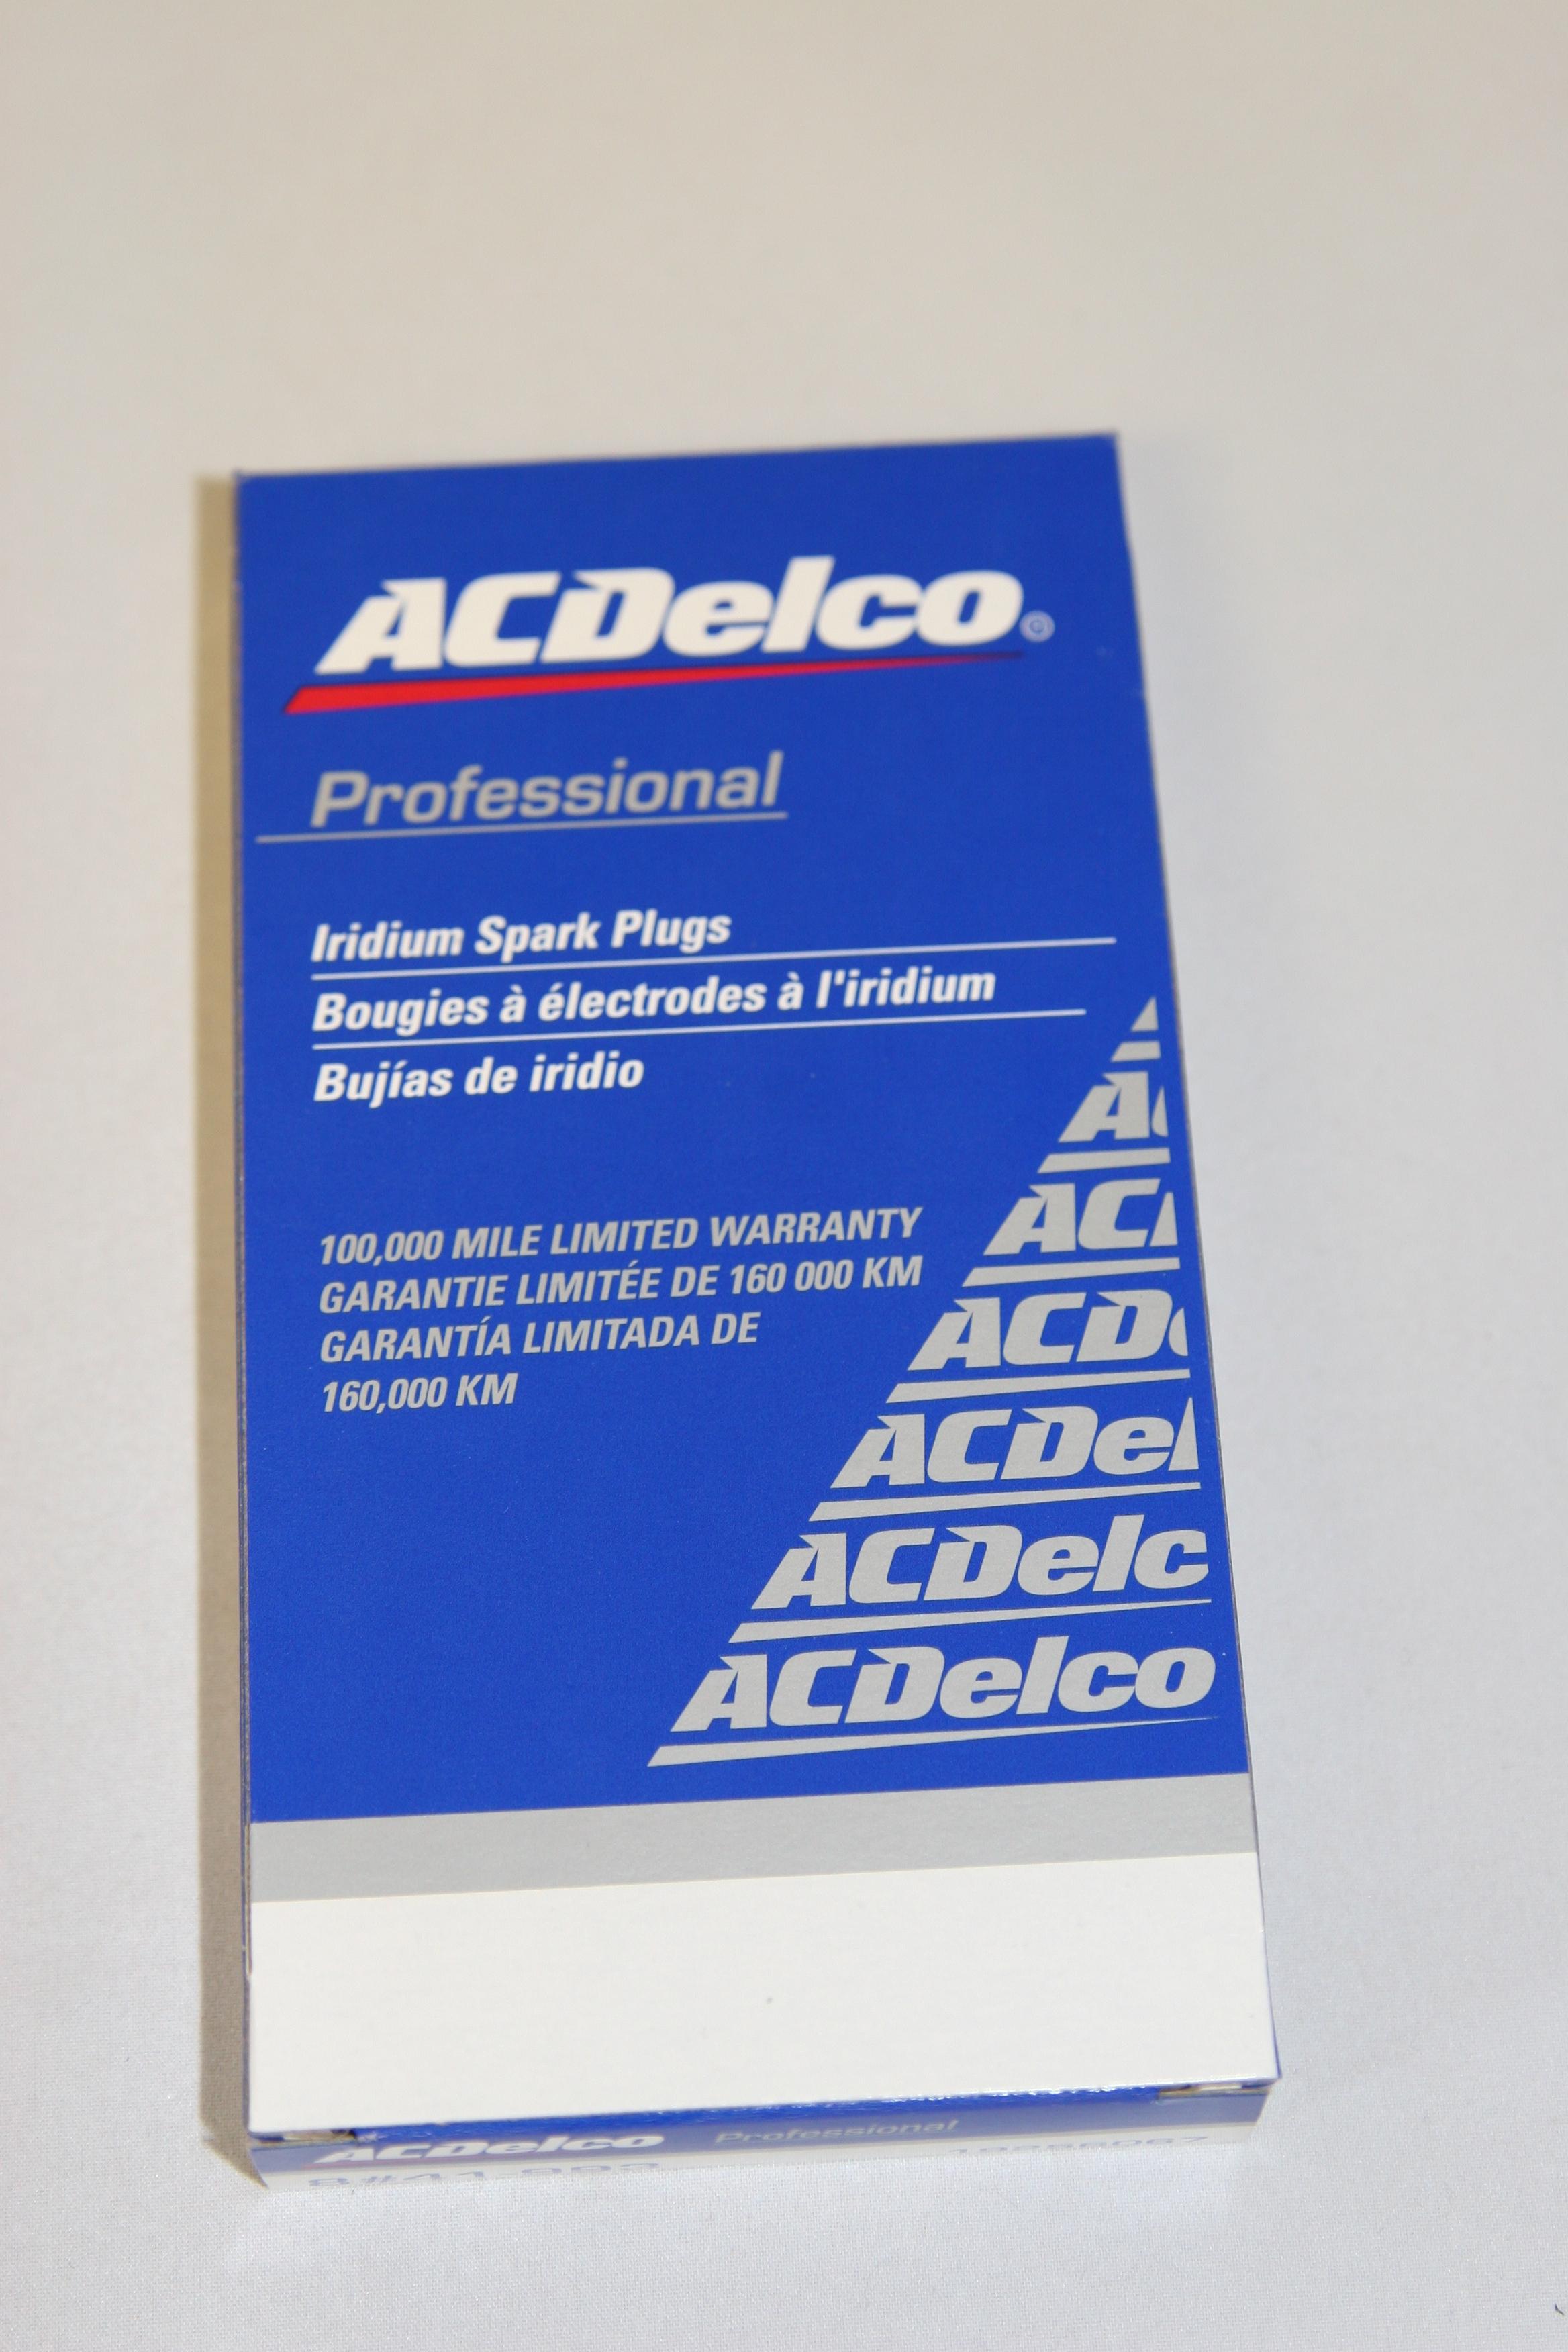 New ACDelco Professional 41-993 GM 19256067 IRIDIUM Spark Plugs Case Pack of 104 - image 7